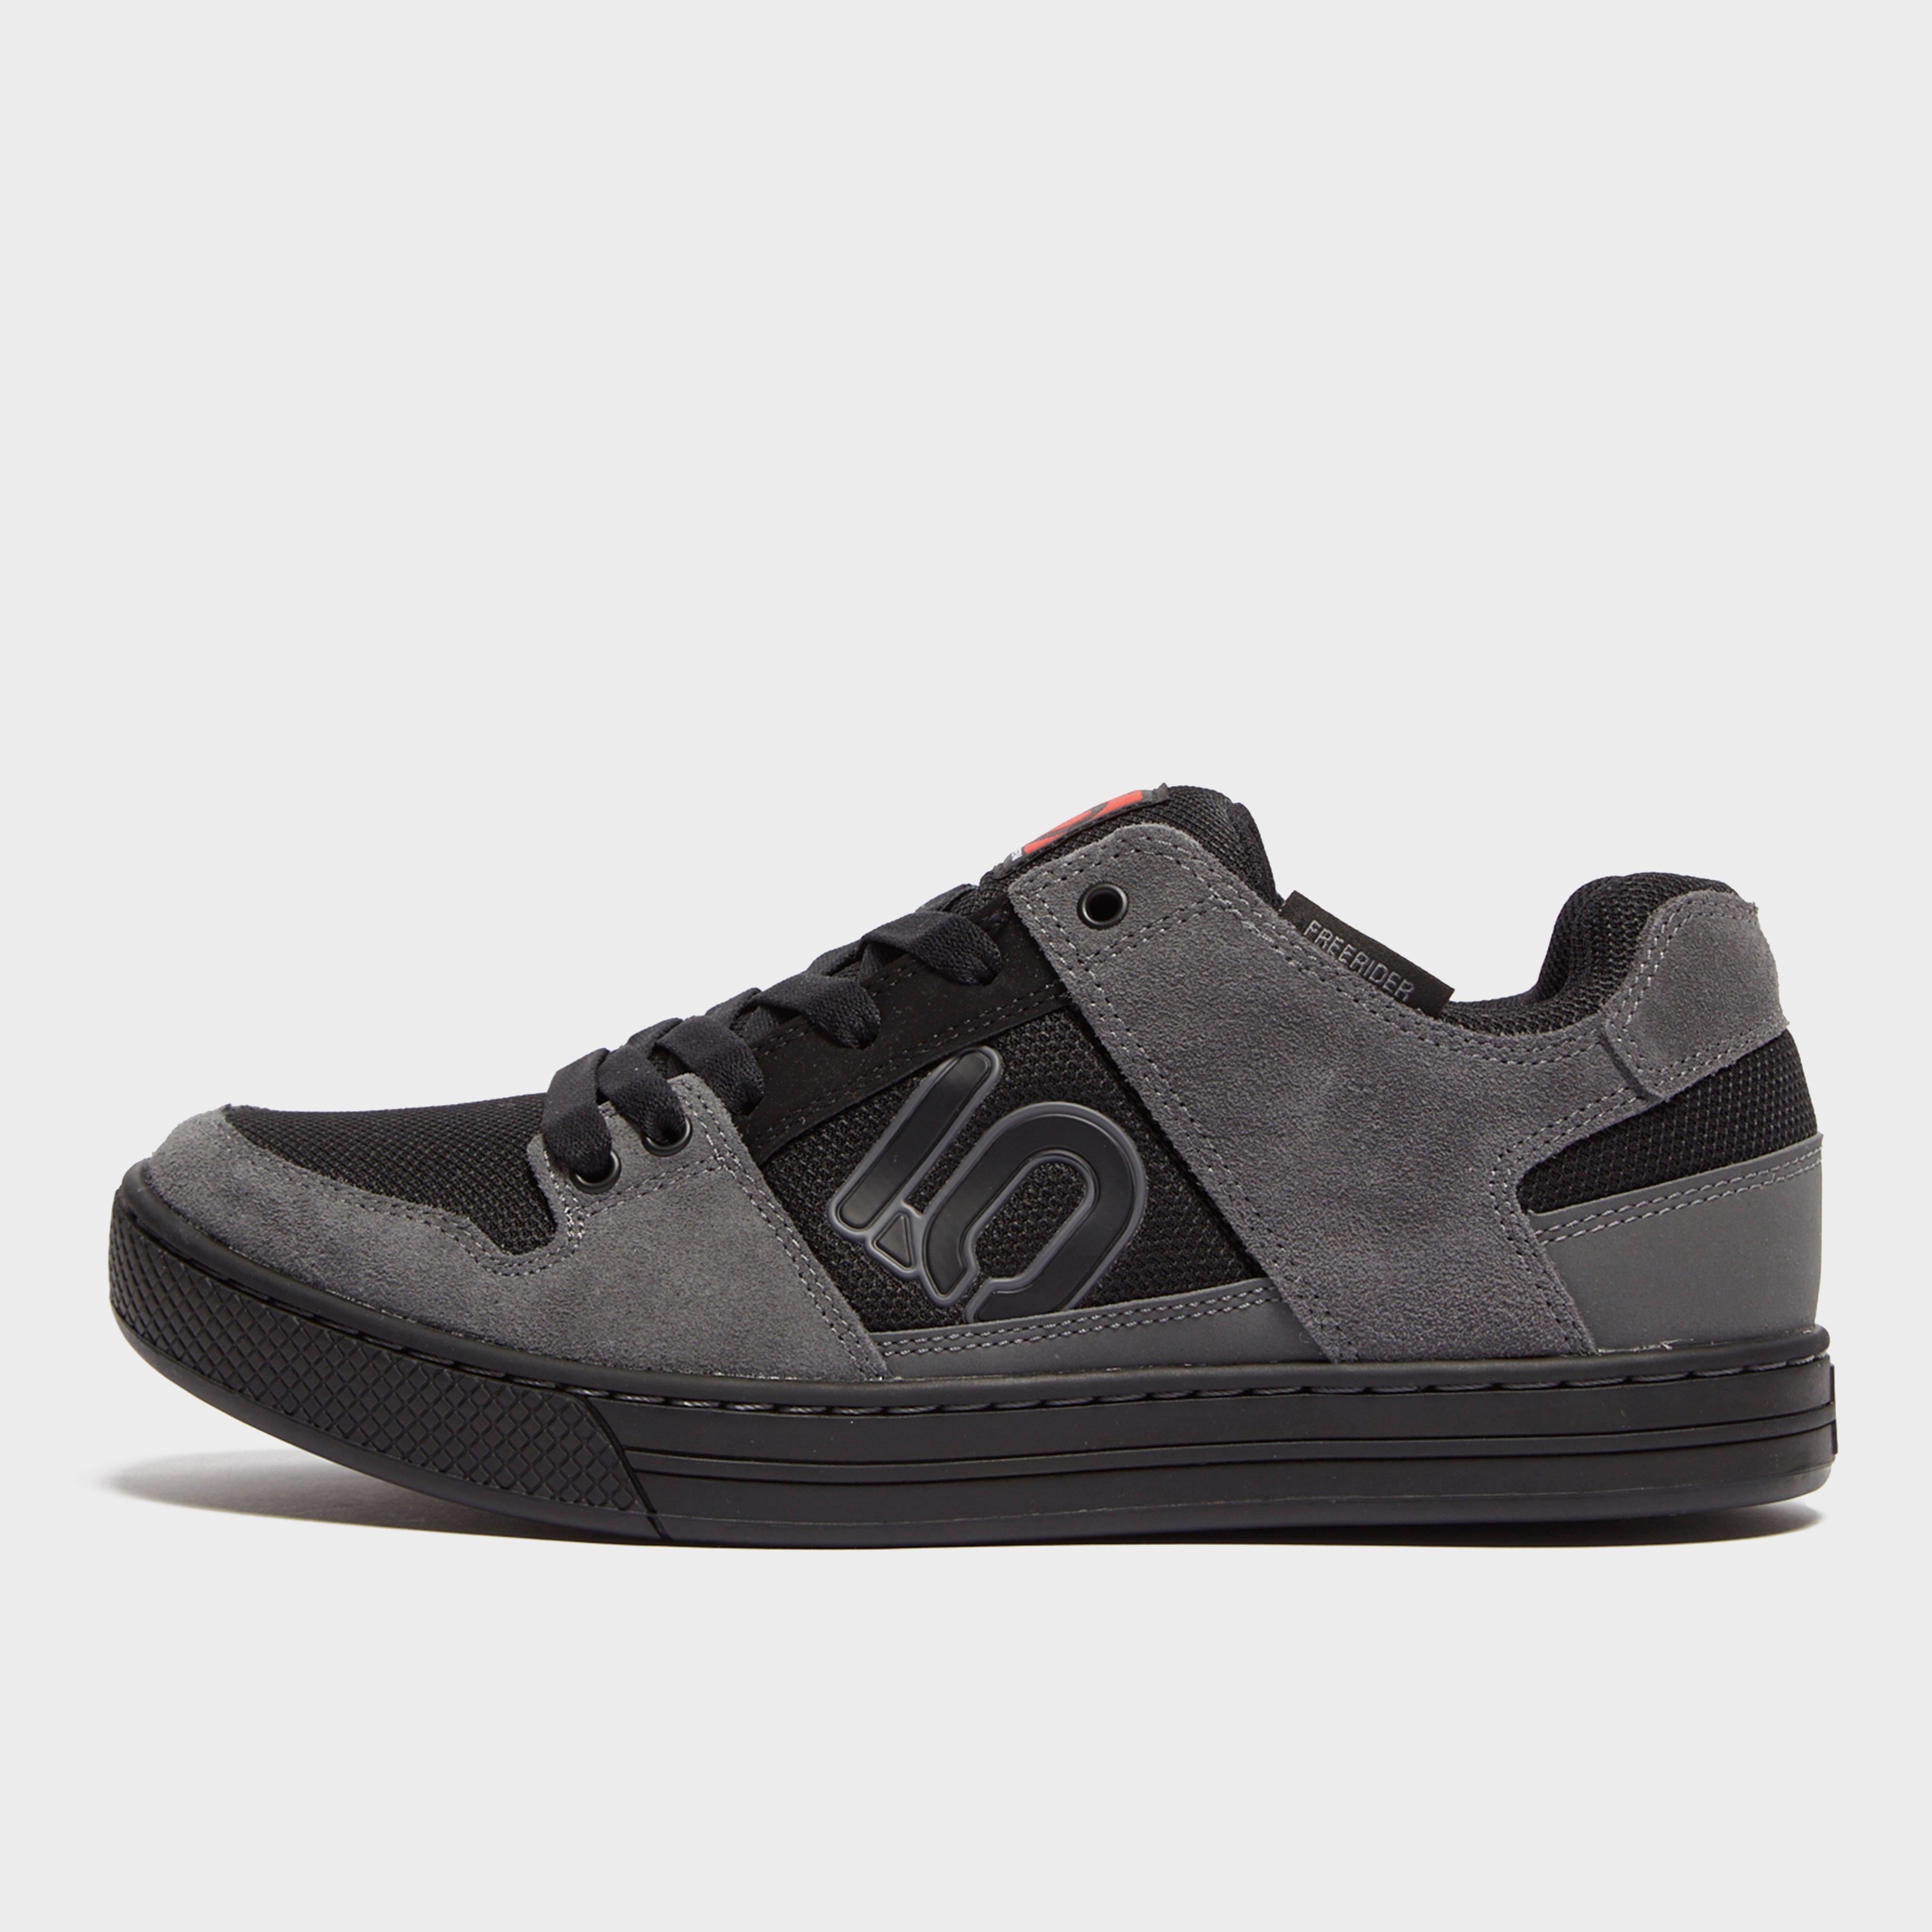 Adidas Five Ten Adidas Five Ten Unisex Freerider Core Shoes - Black, Black